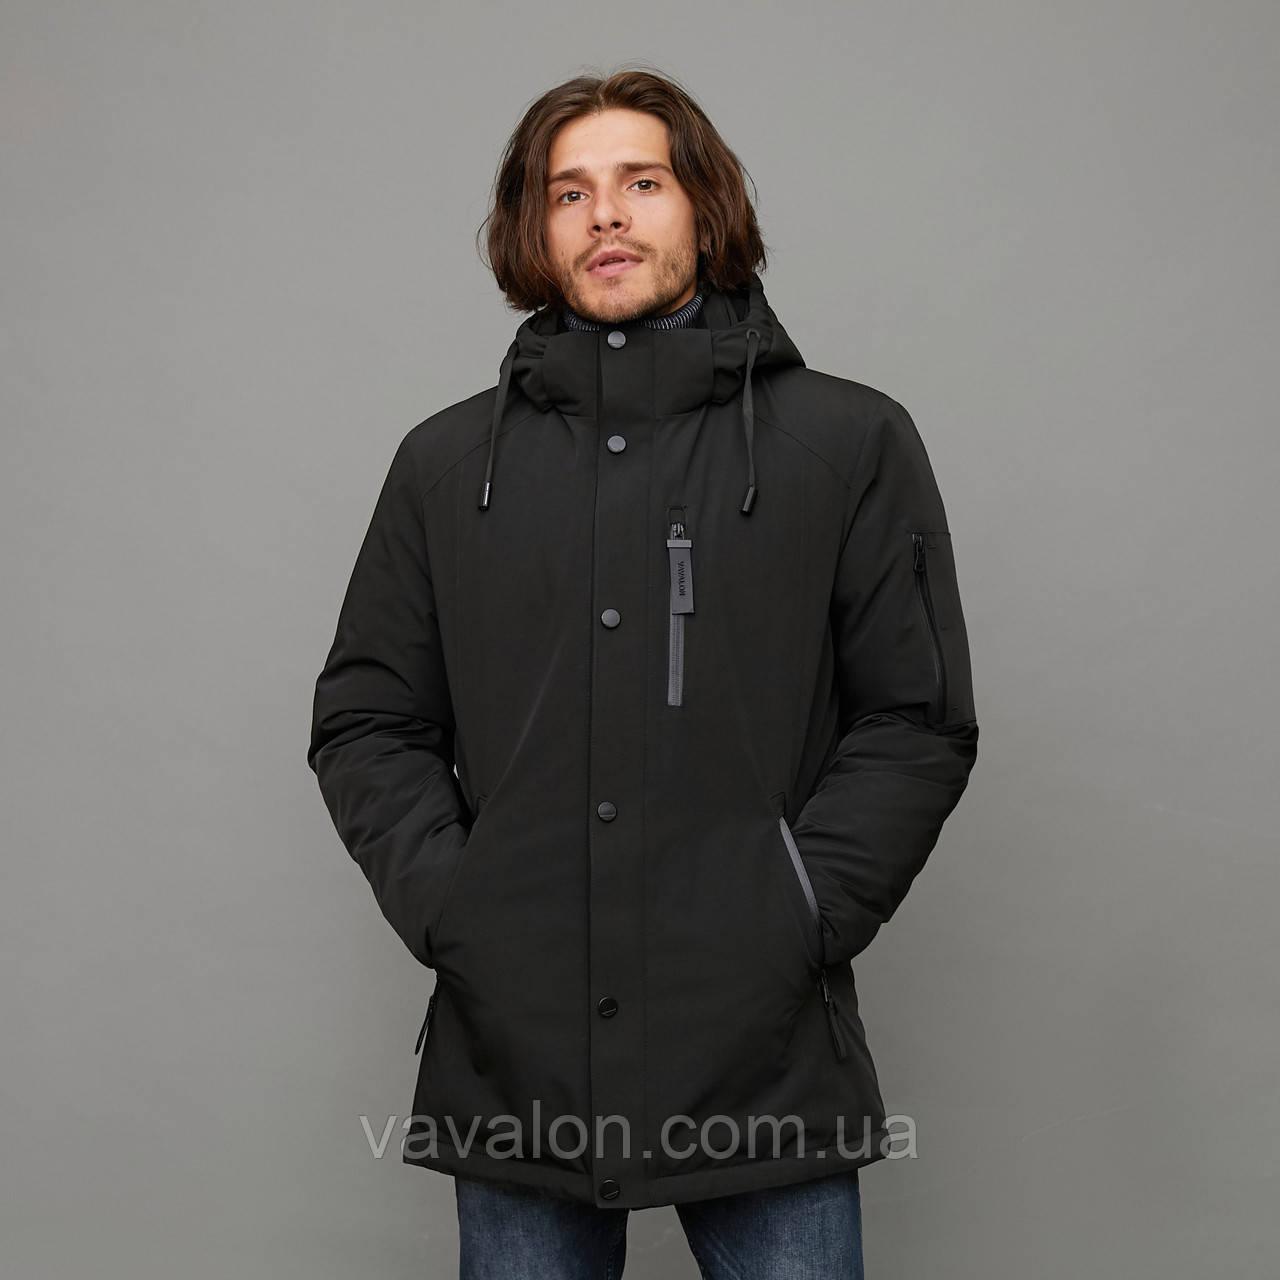 Зимняя мужская куртка Vavalon KZ-2003 Black